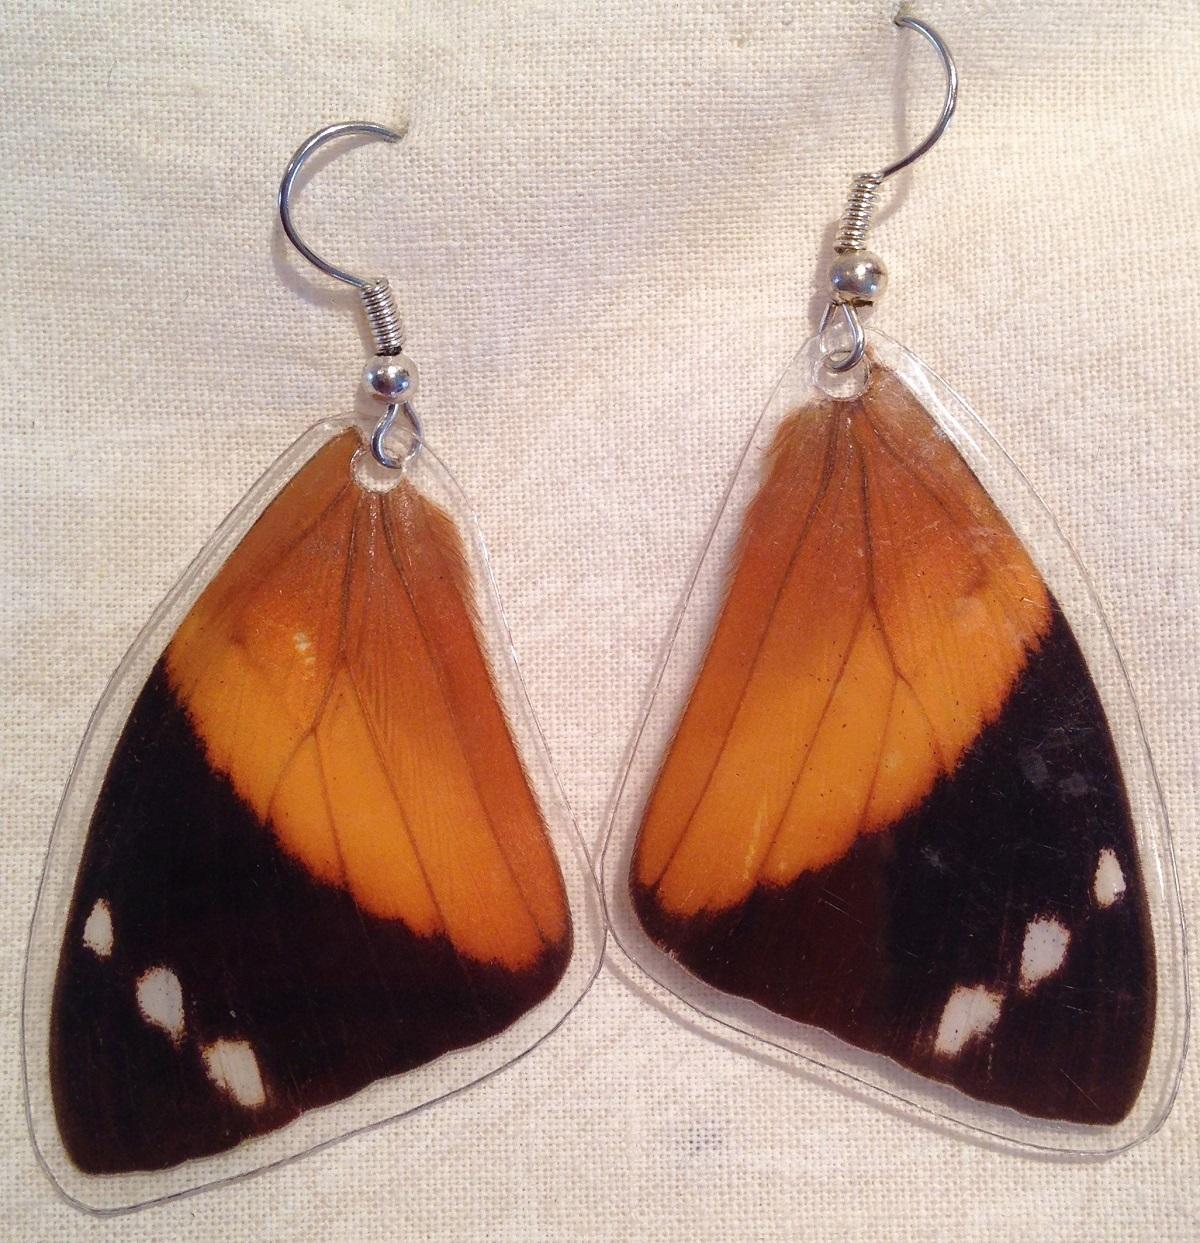 Butterfly Wing (blomfild's Beauty, Smyrna Blomfildia) Earrings 1